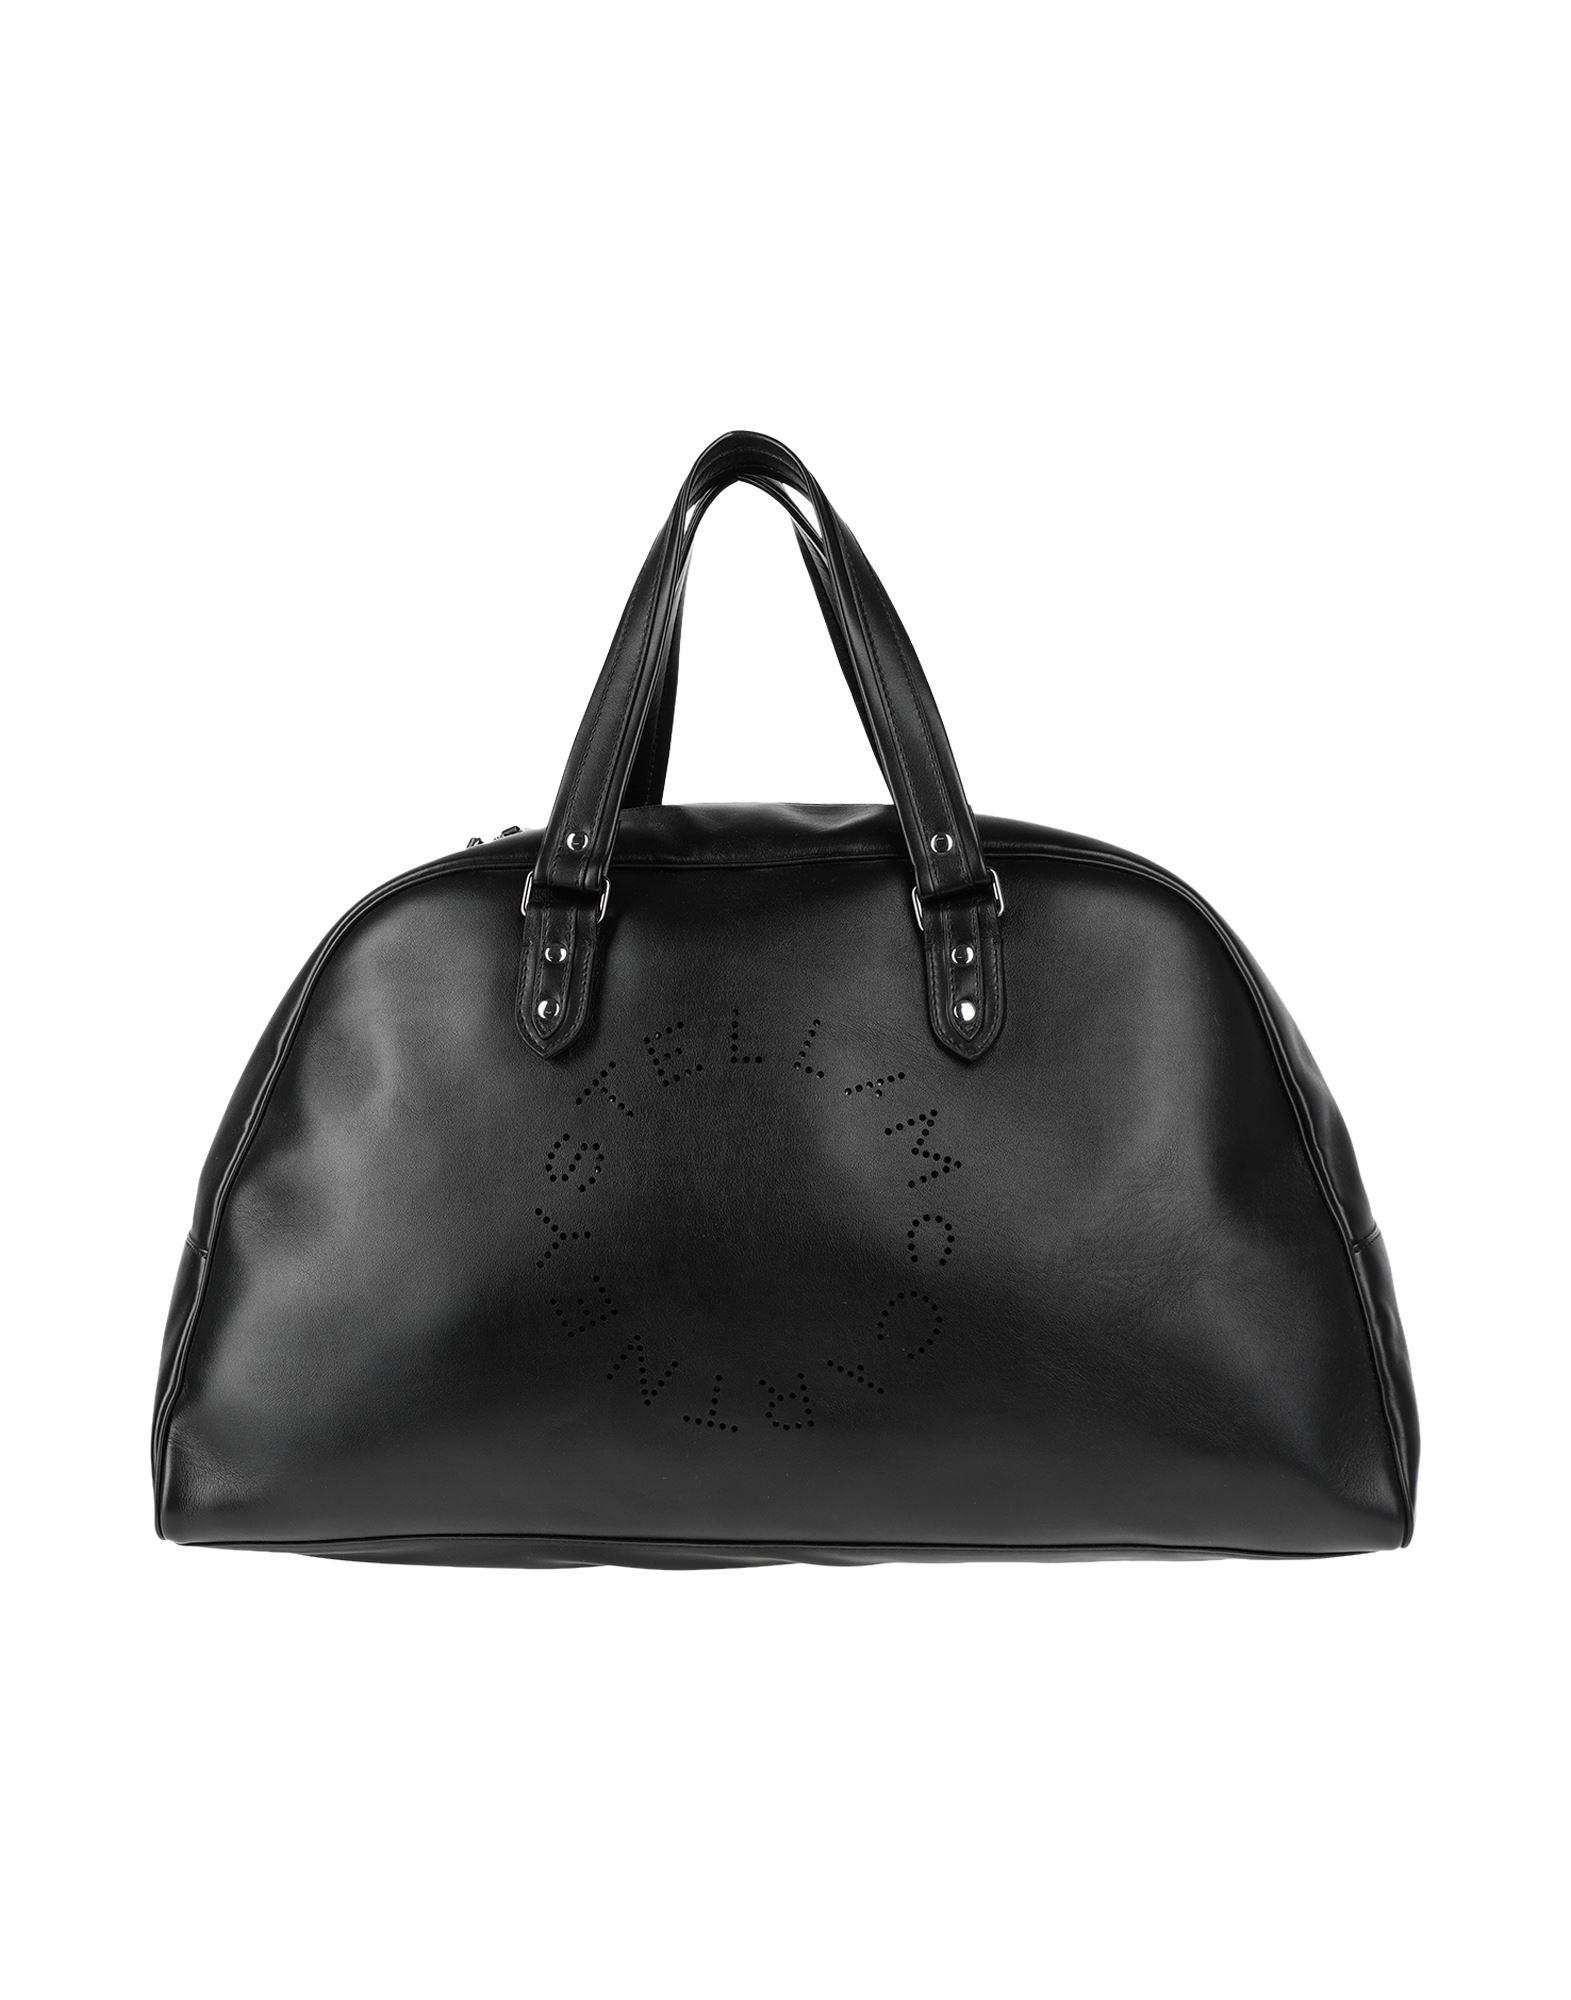 STELLA McCARTNEY Travel duffel bags - Item 45577092